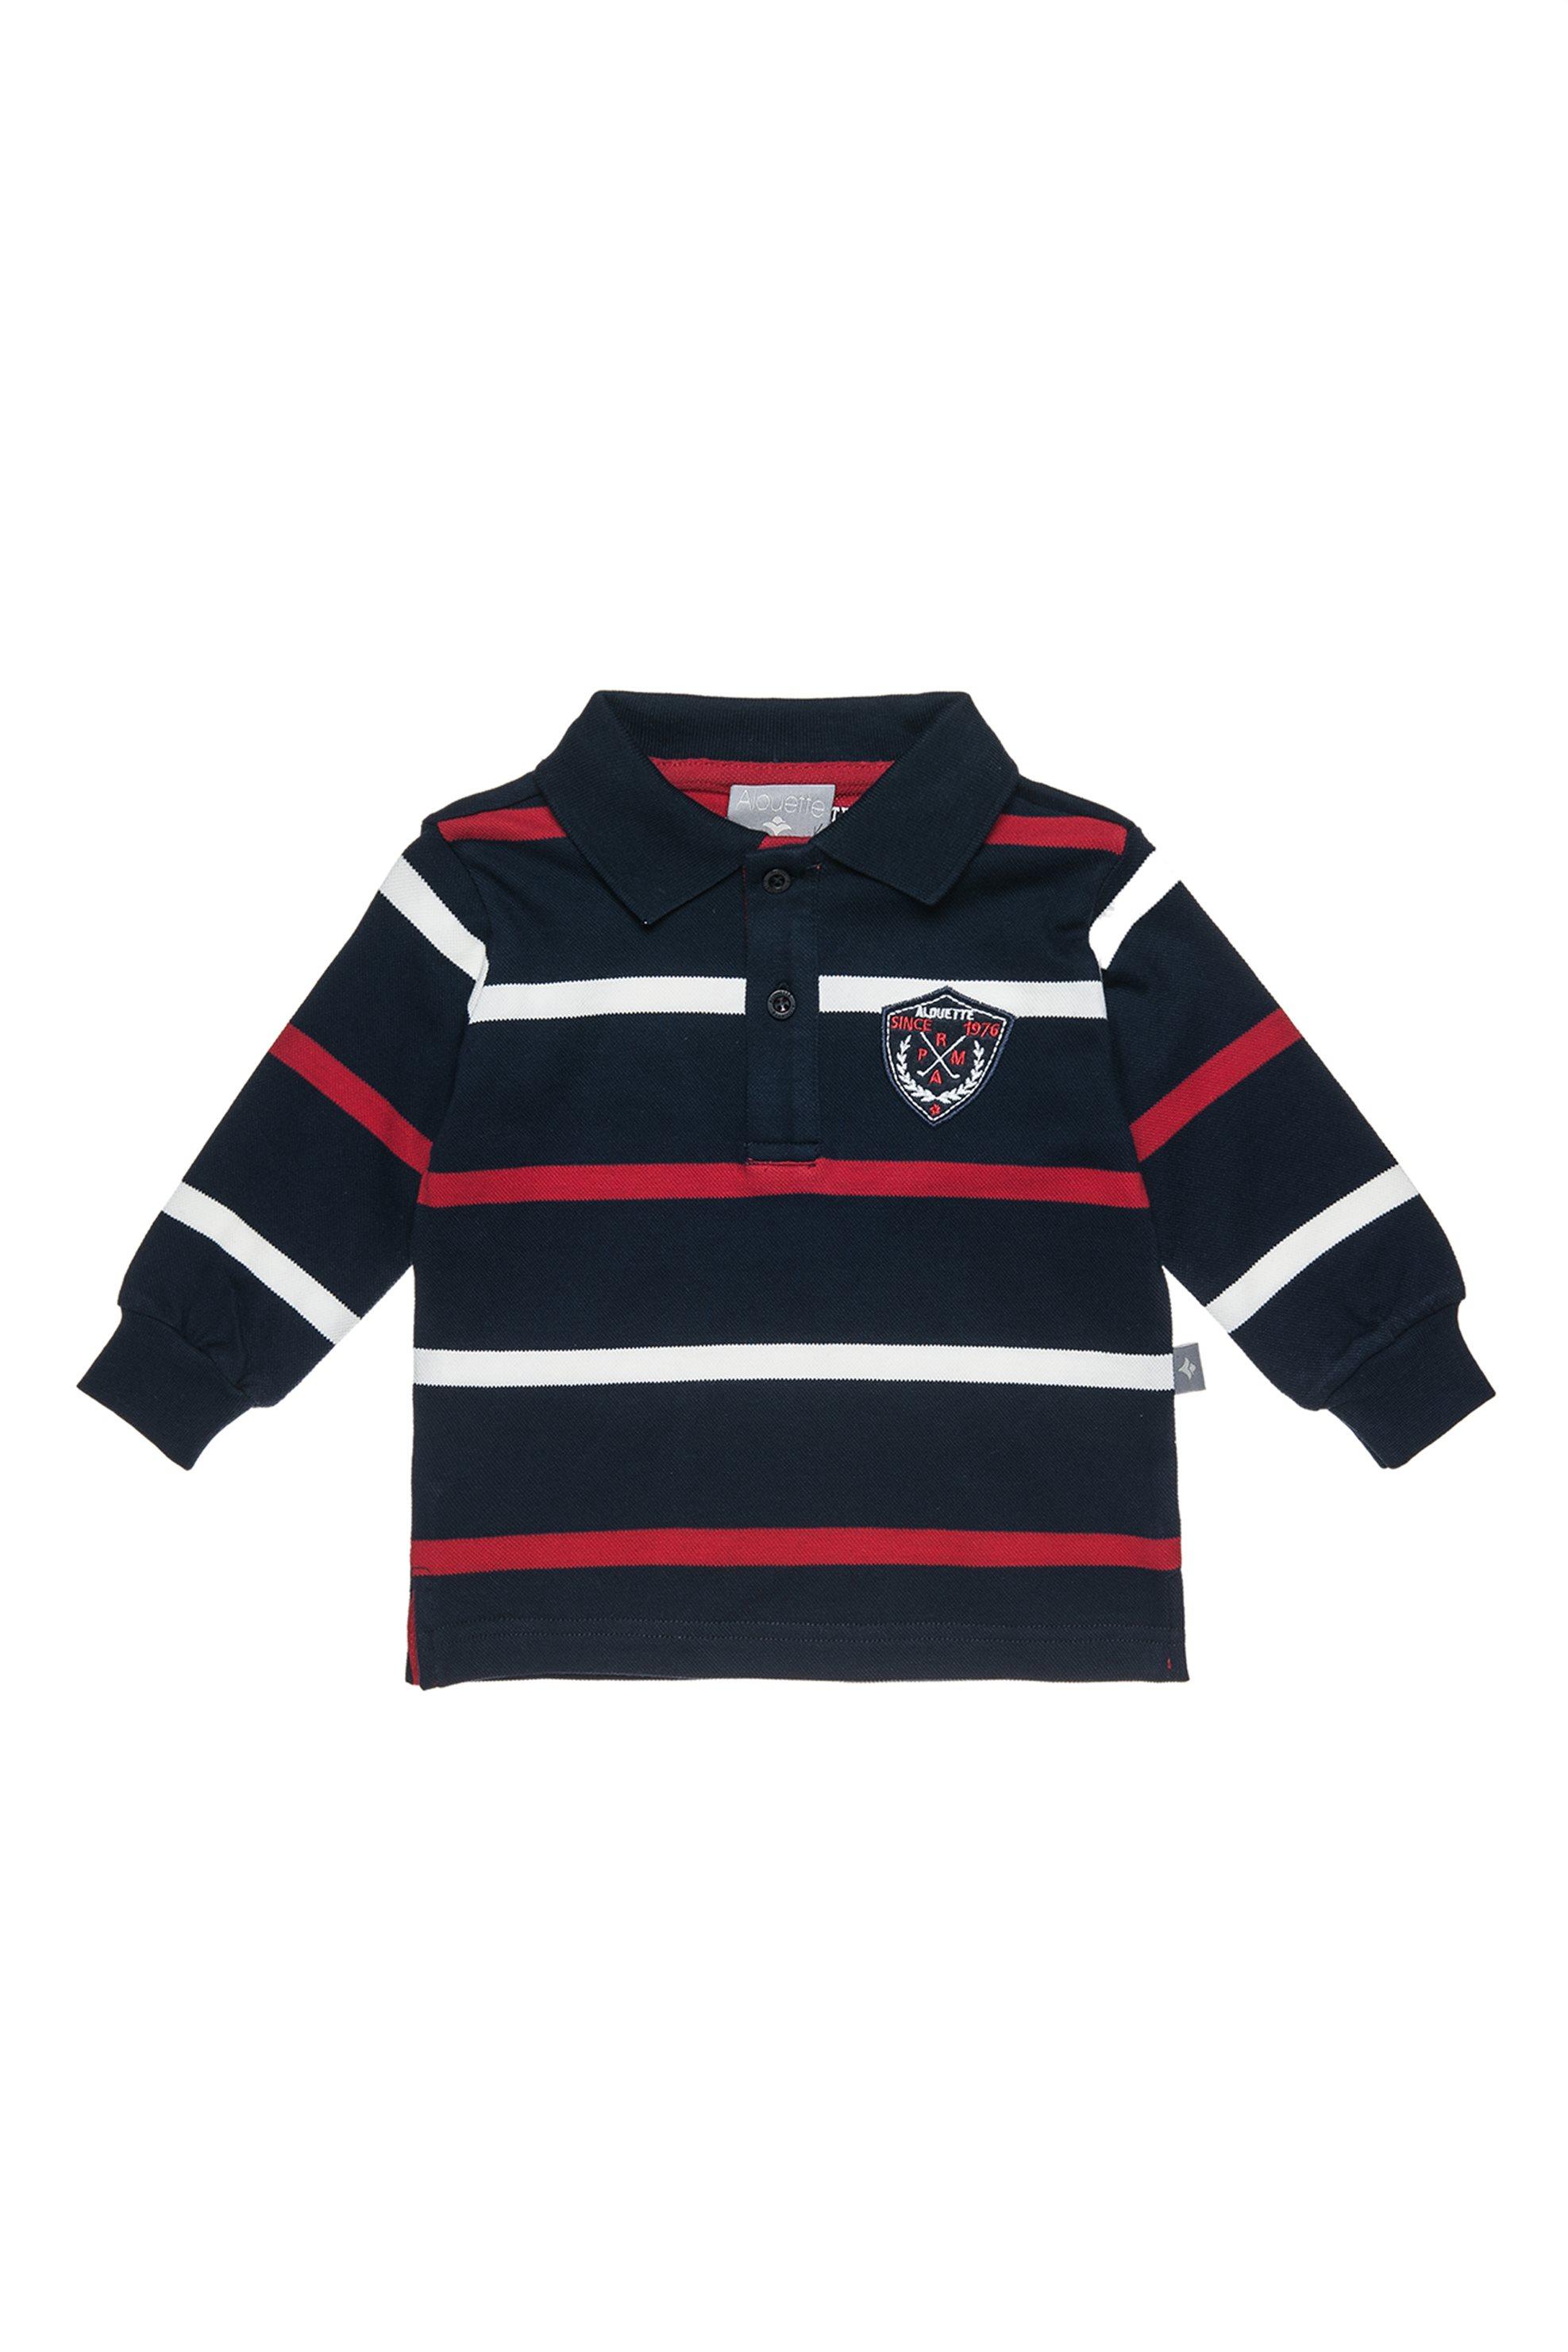 Notos Alouette παιδική μπλούζα ριγέ polo με patch - 00221294 - Κόκκινο 942f4befcd4